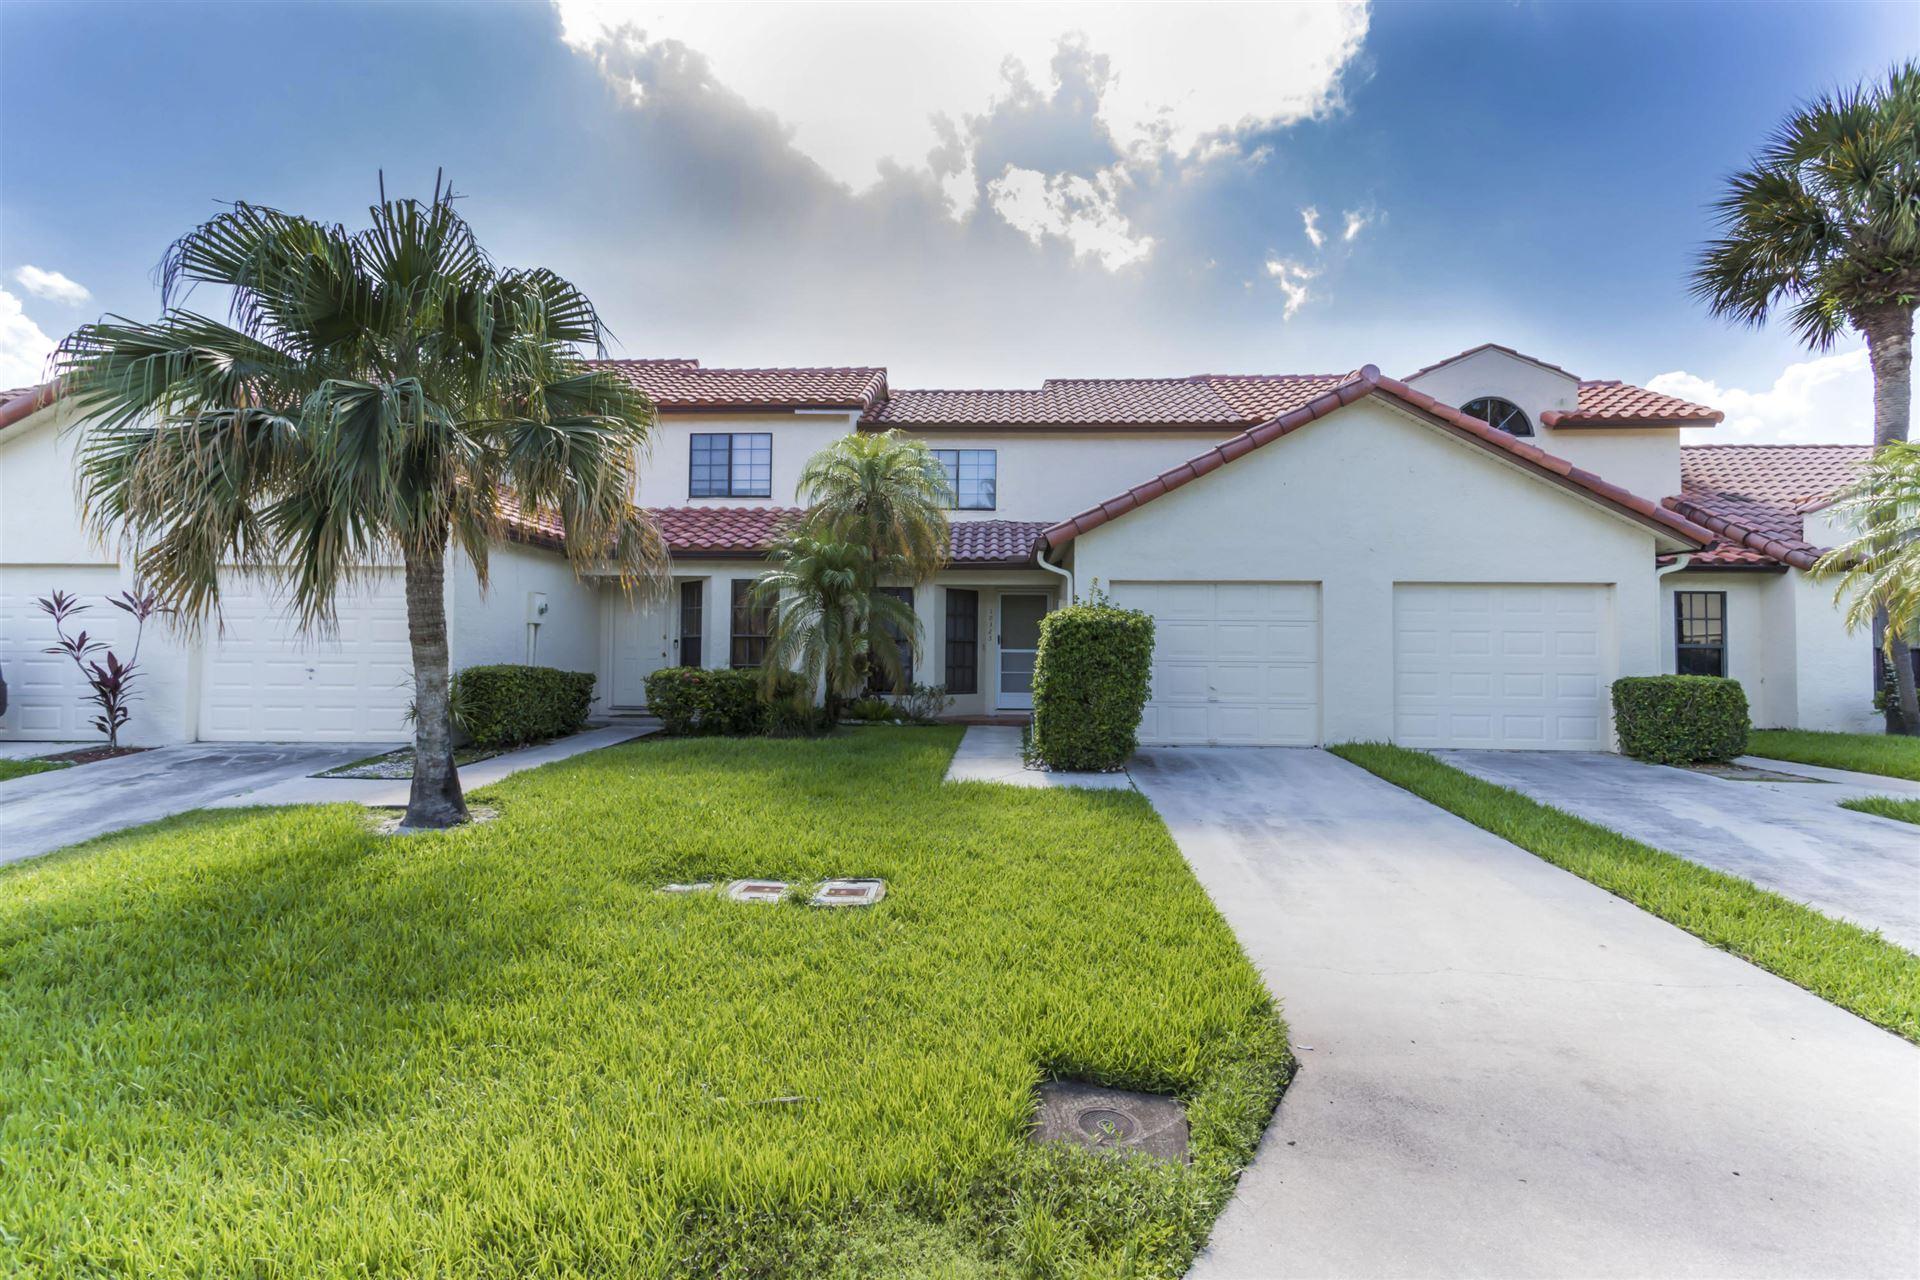 10323 Hidden Springs Court, Boca Raton, FL 33498 - #: RX-10638325